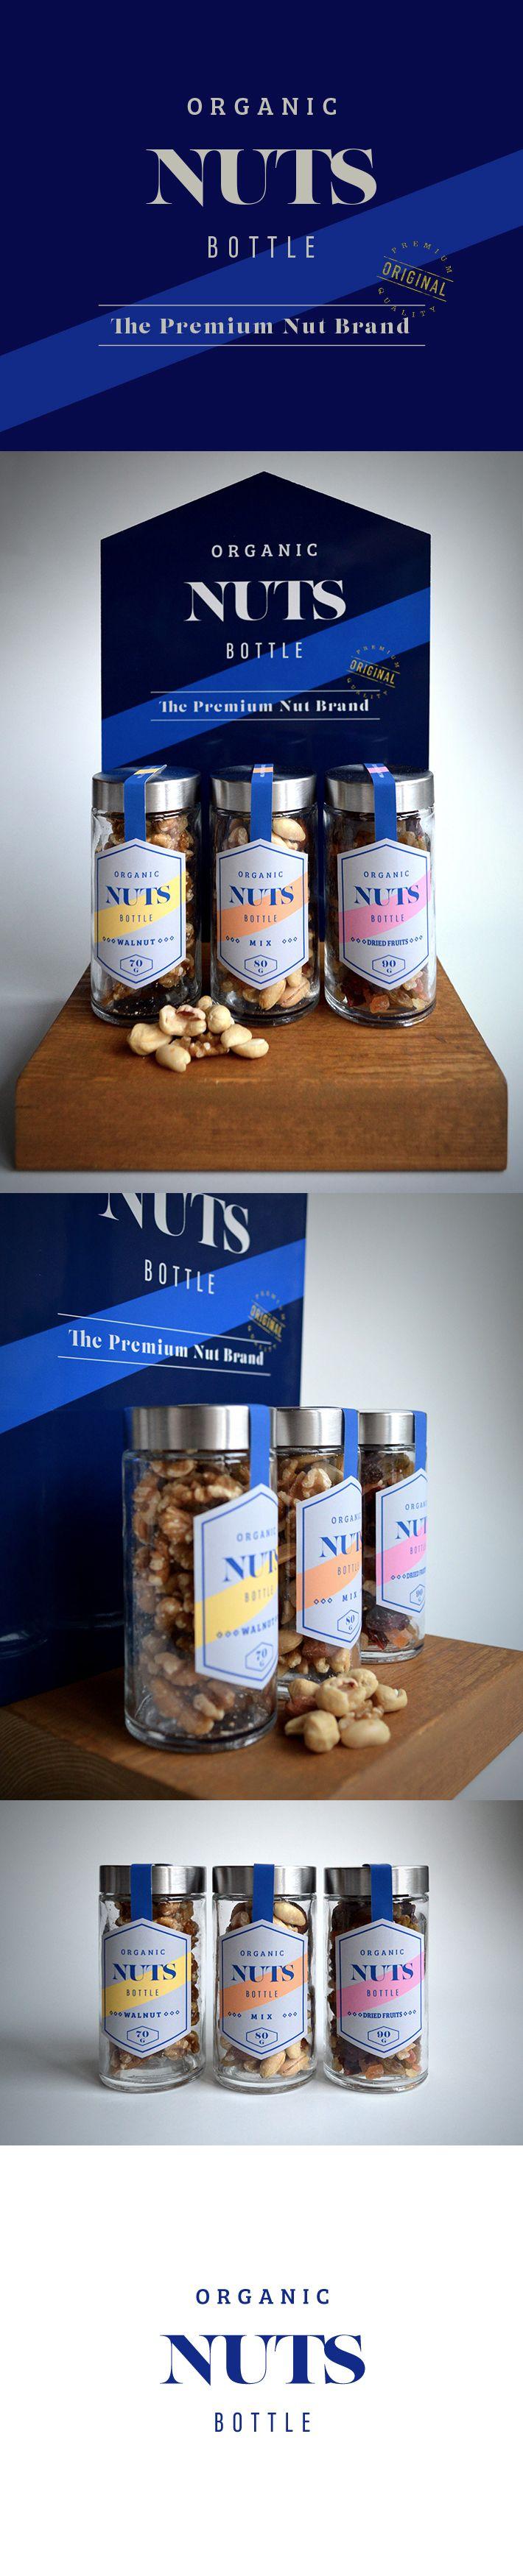 [Organic Nuts Bottle(Concept)] Designed by Takuji Omori #organic #packagedesign #branding